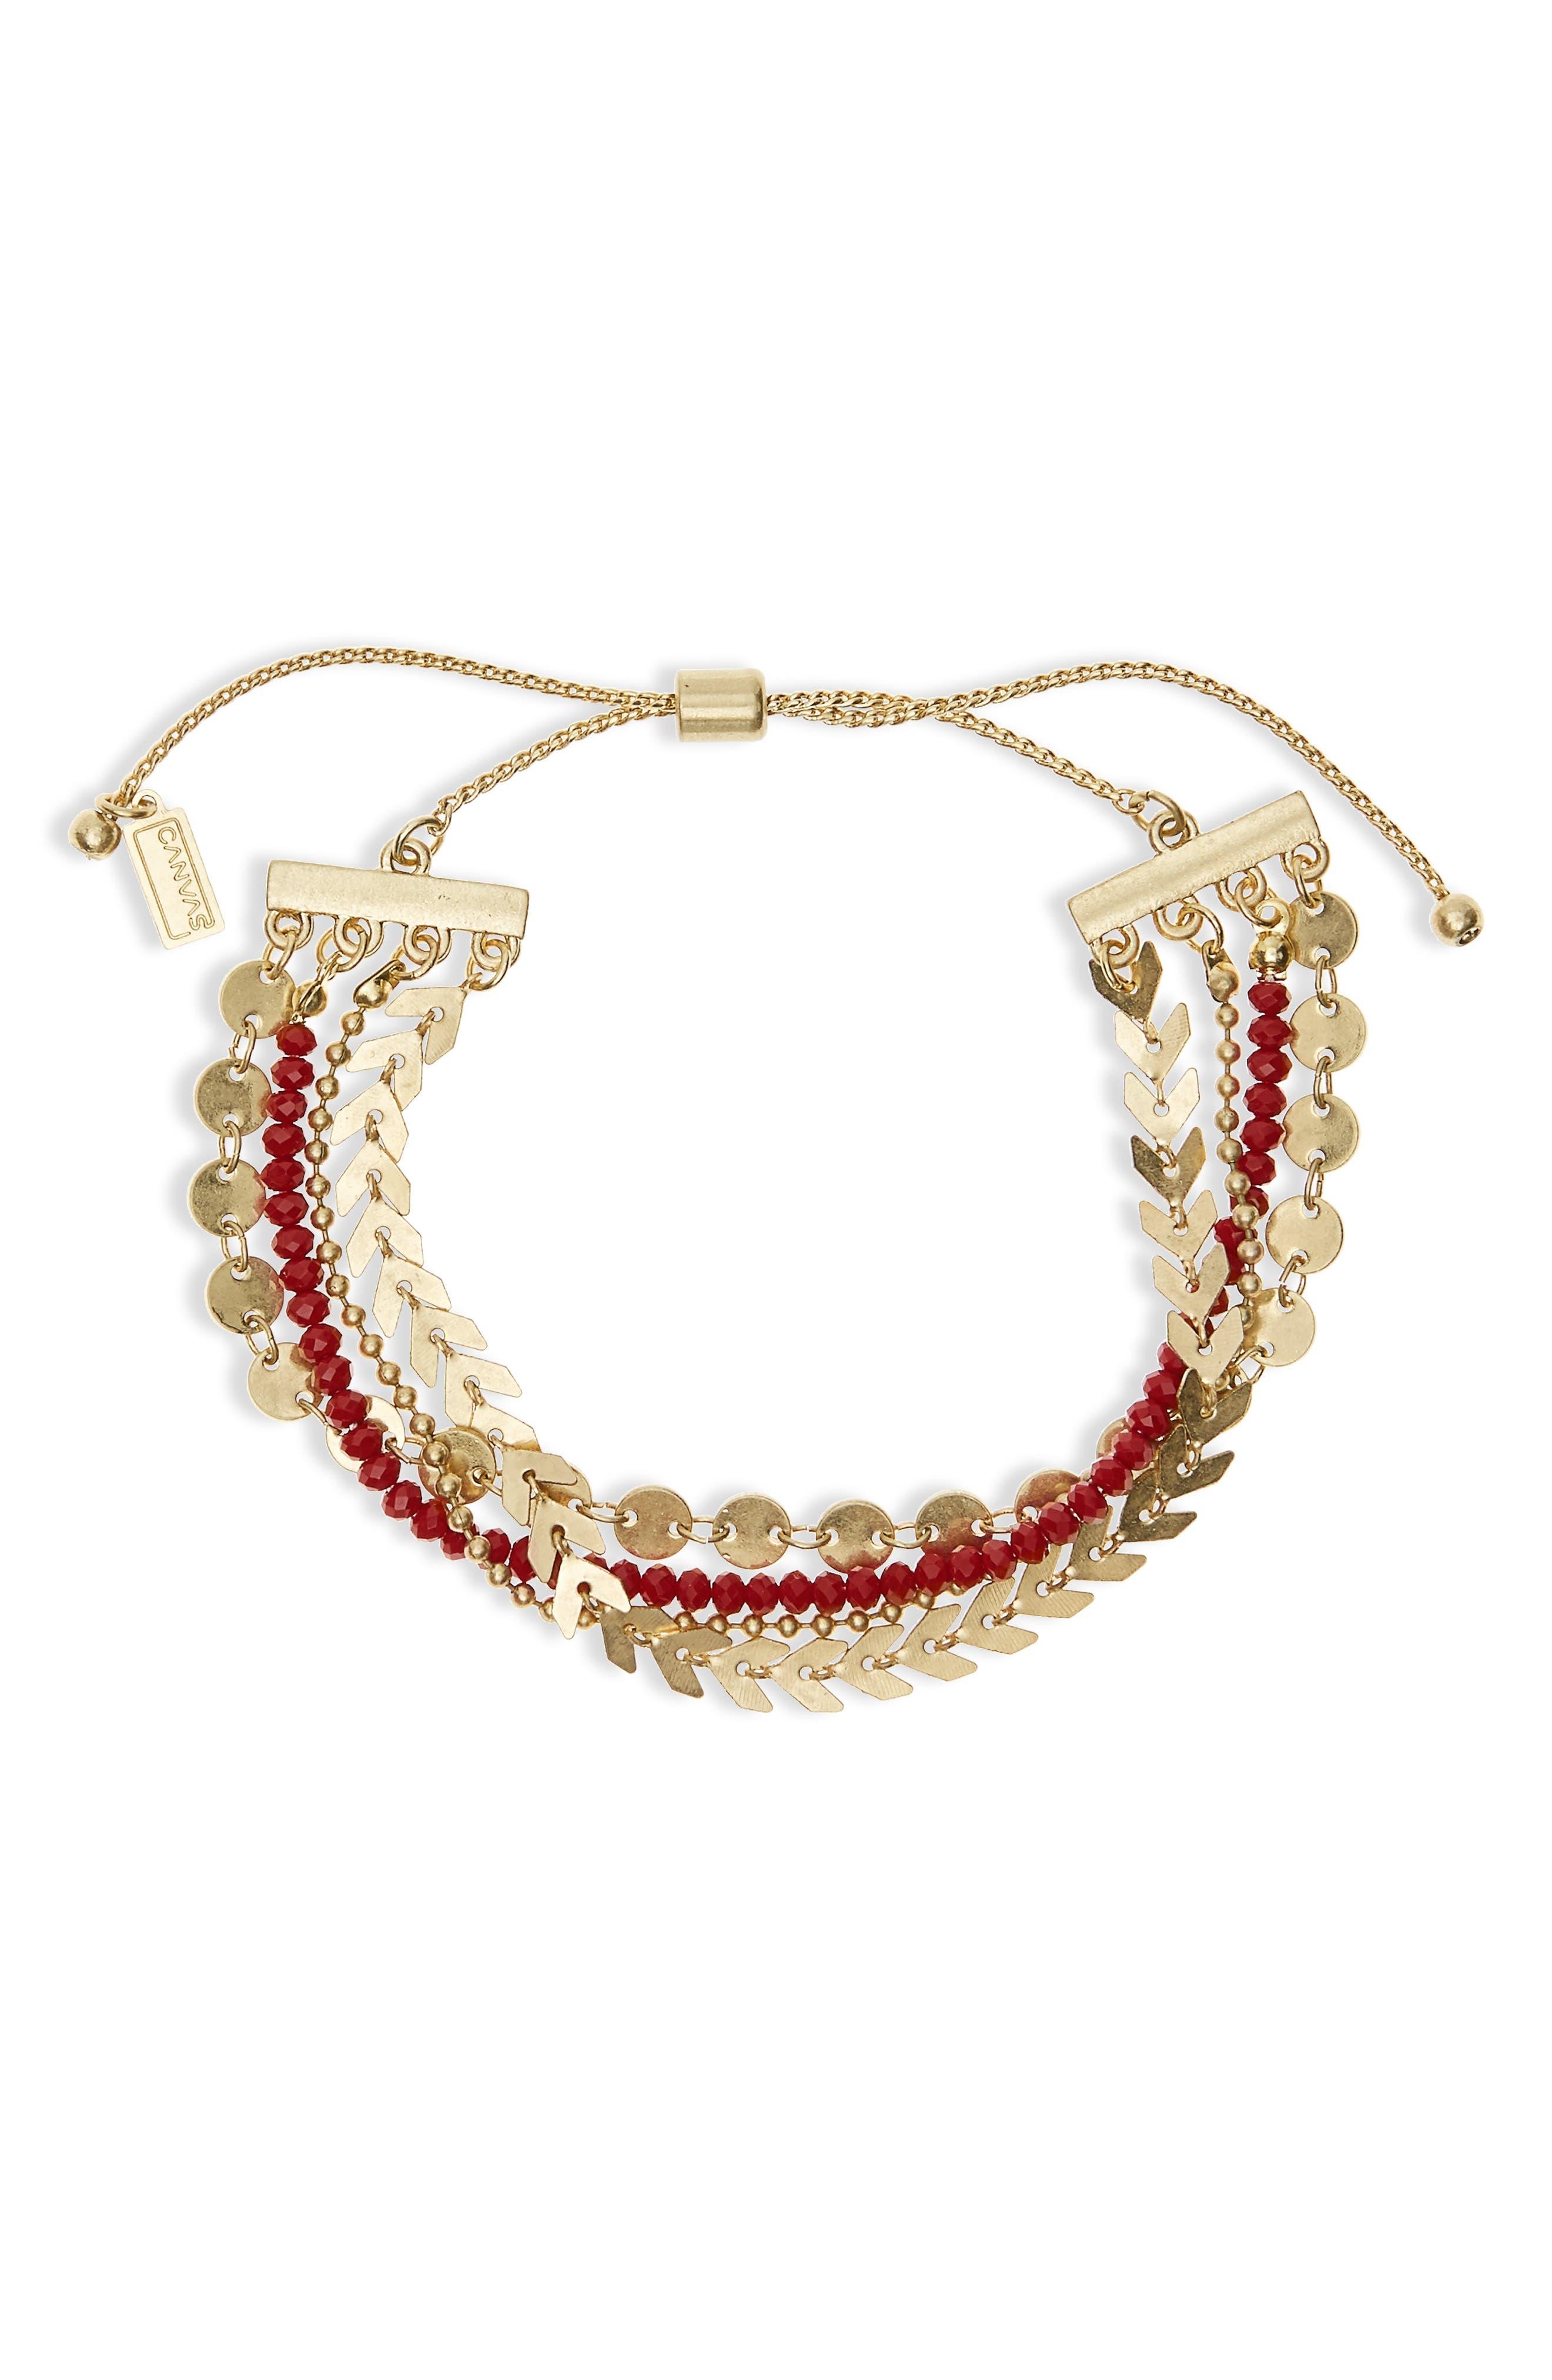 Main Image - Canvas Jewelry Beaded Friendship Bracelet